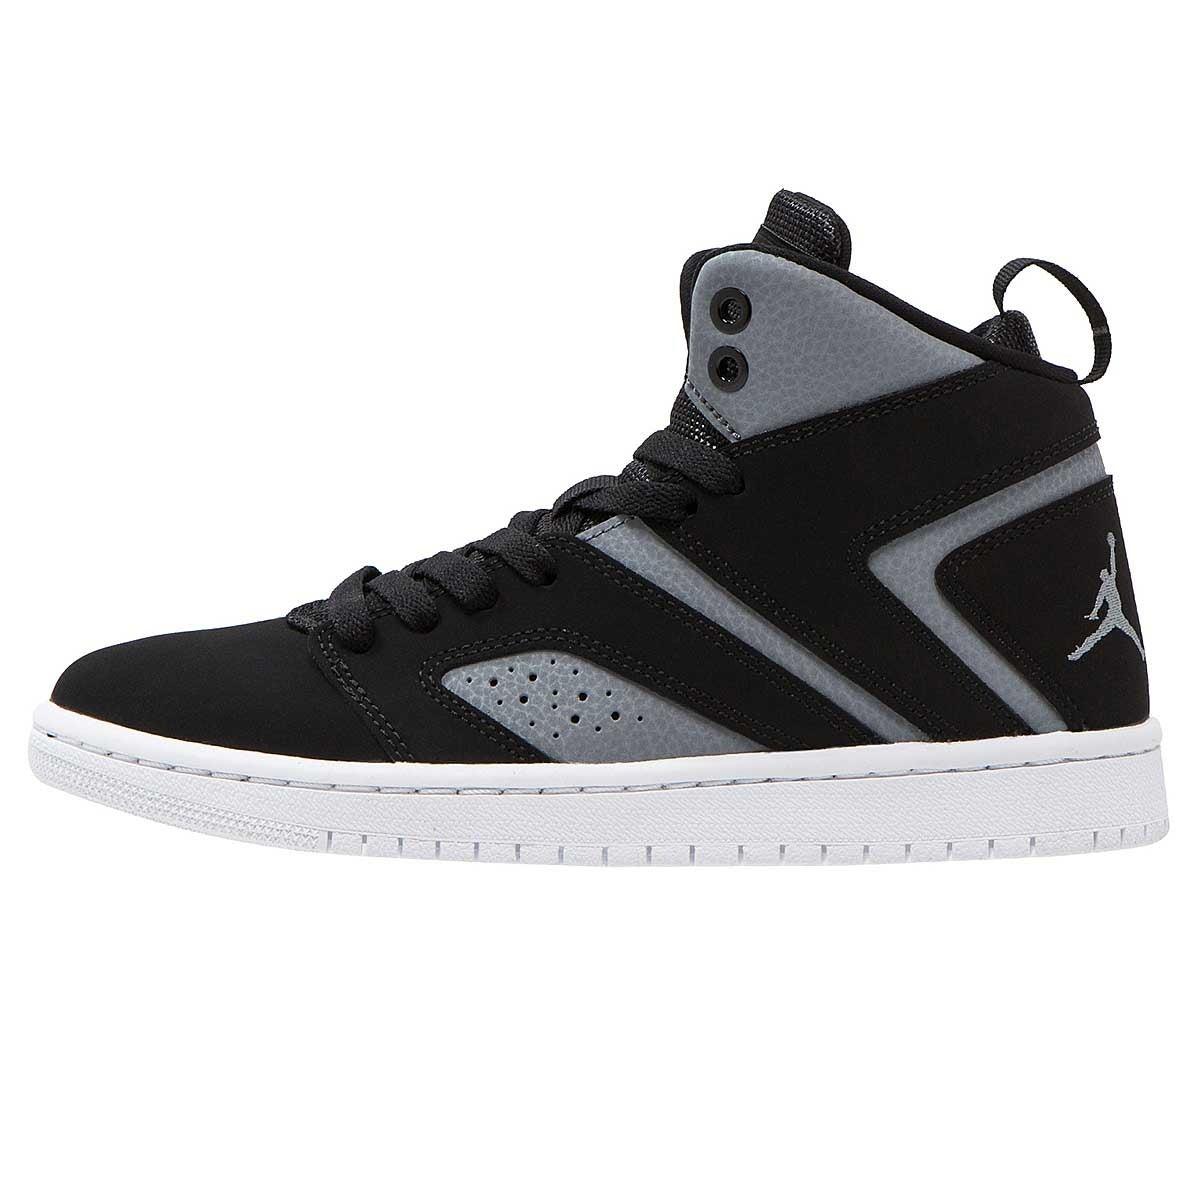 newest 2ec94 59509 Buy Men s Athletic Shoes Online at Overstock   Our Best Men s Shoes Deals